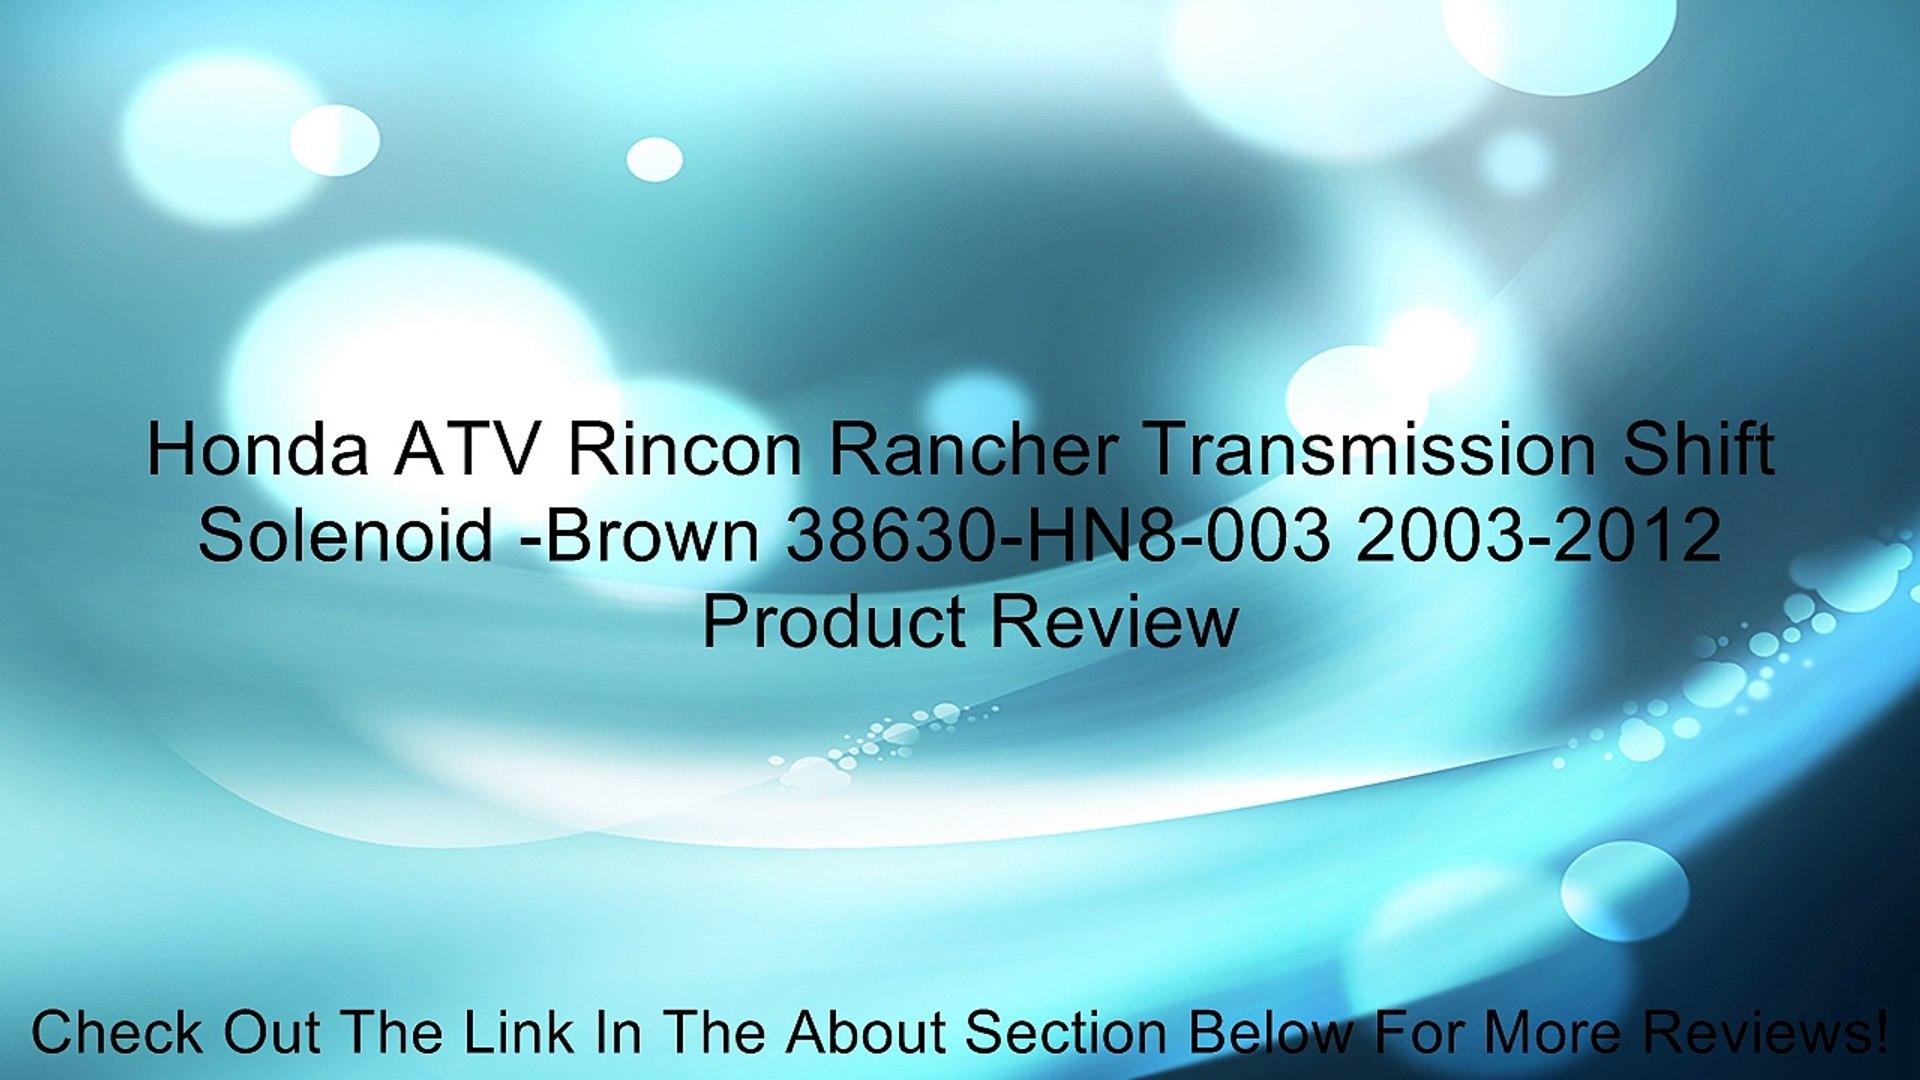 Honda ATV Rincon Rancher Transmission Shift Solenoid -Brown 38630-HN8-003  2003-2012 Review